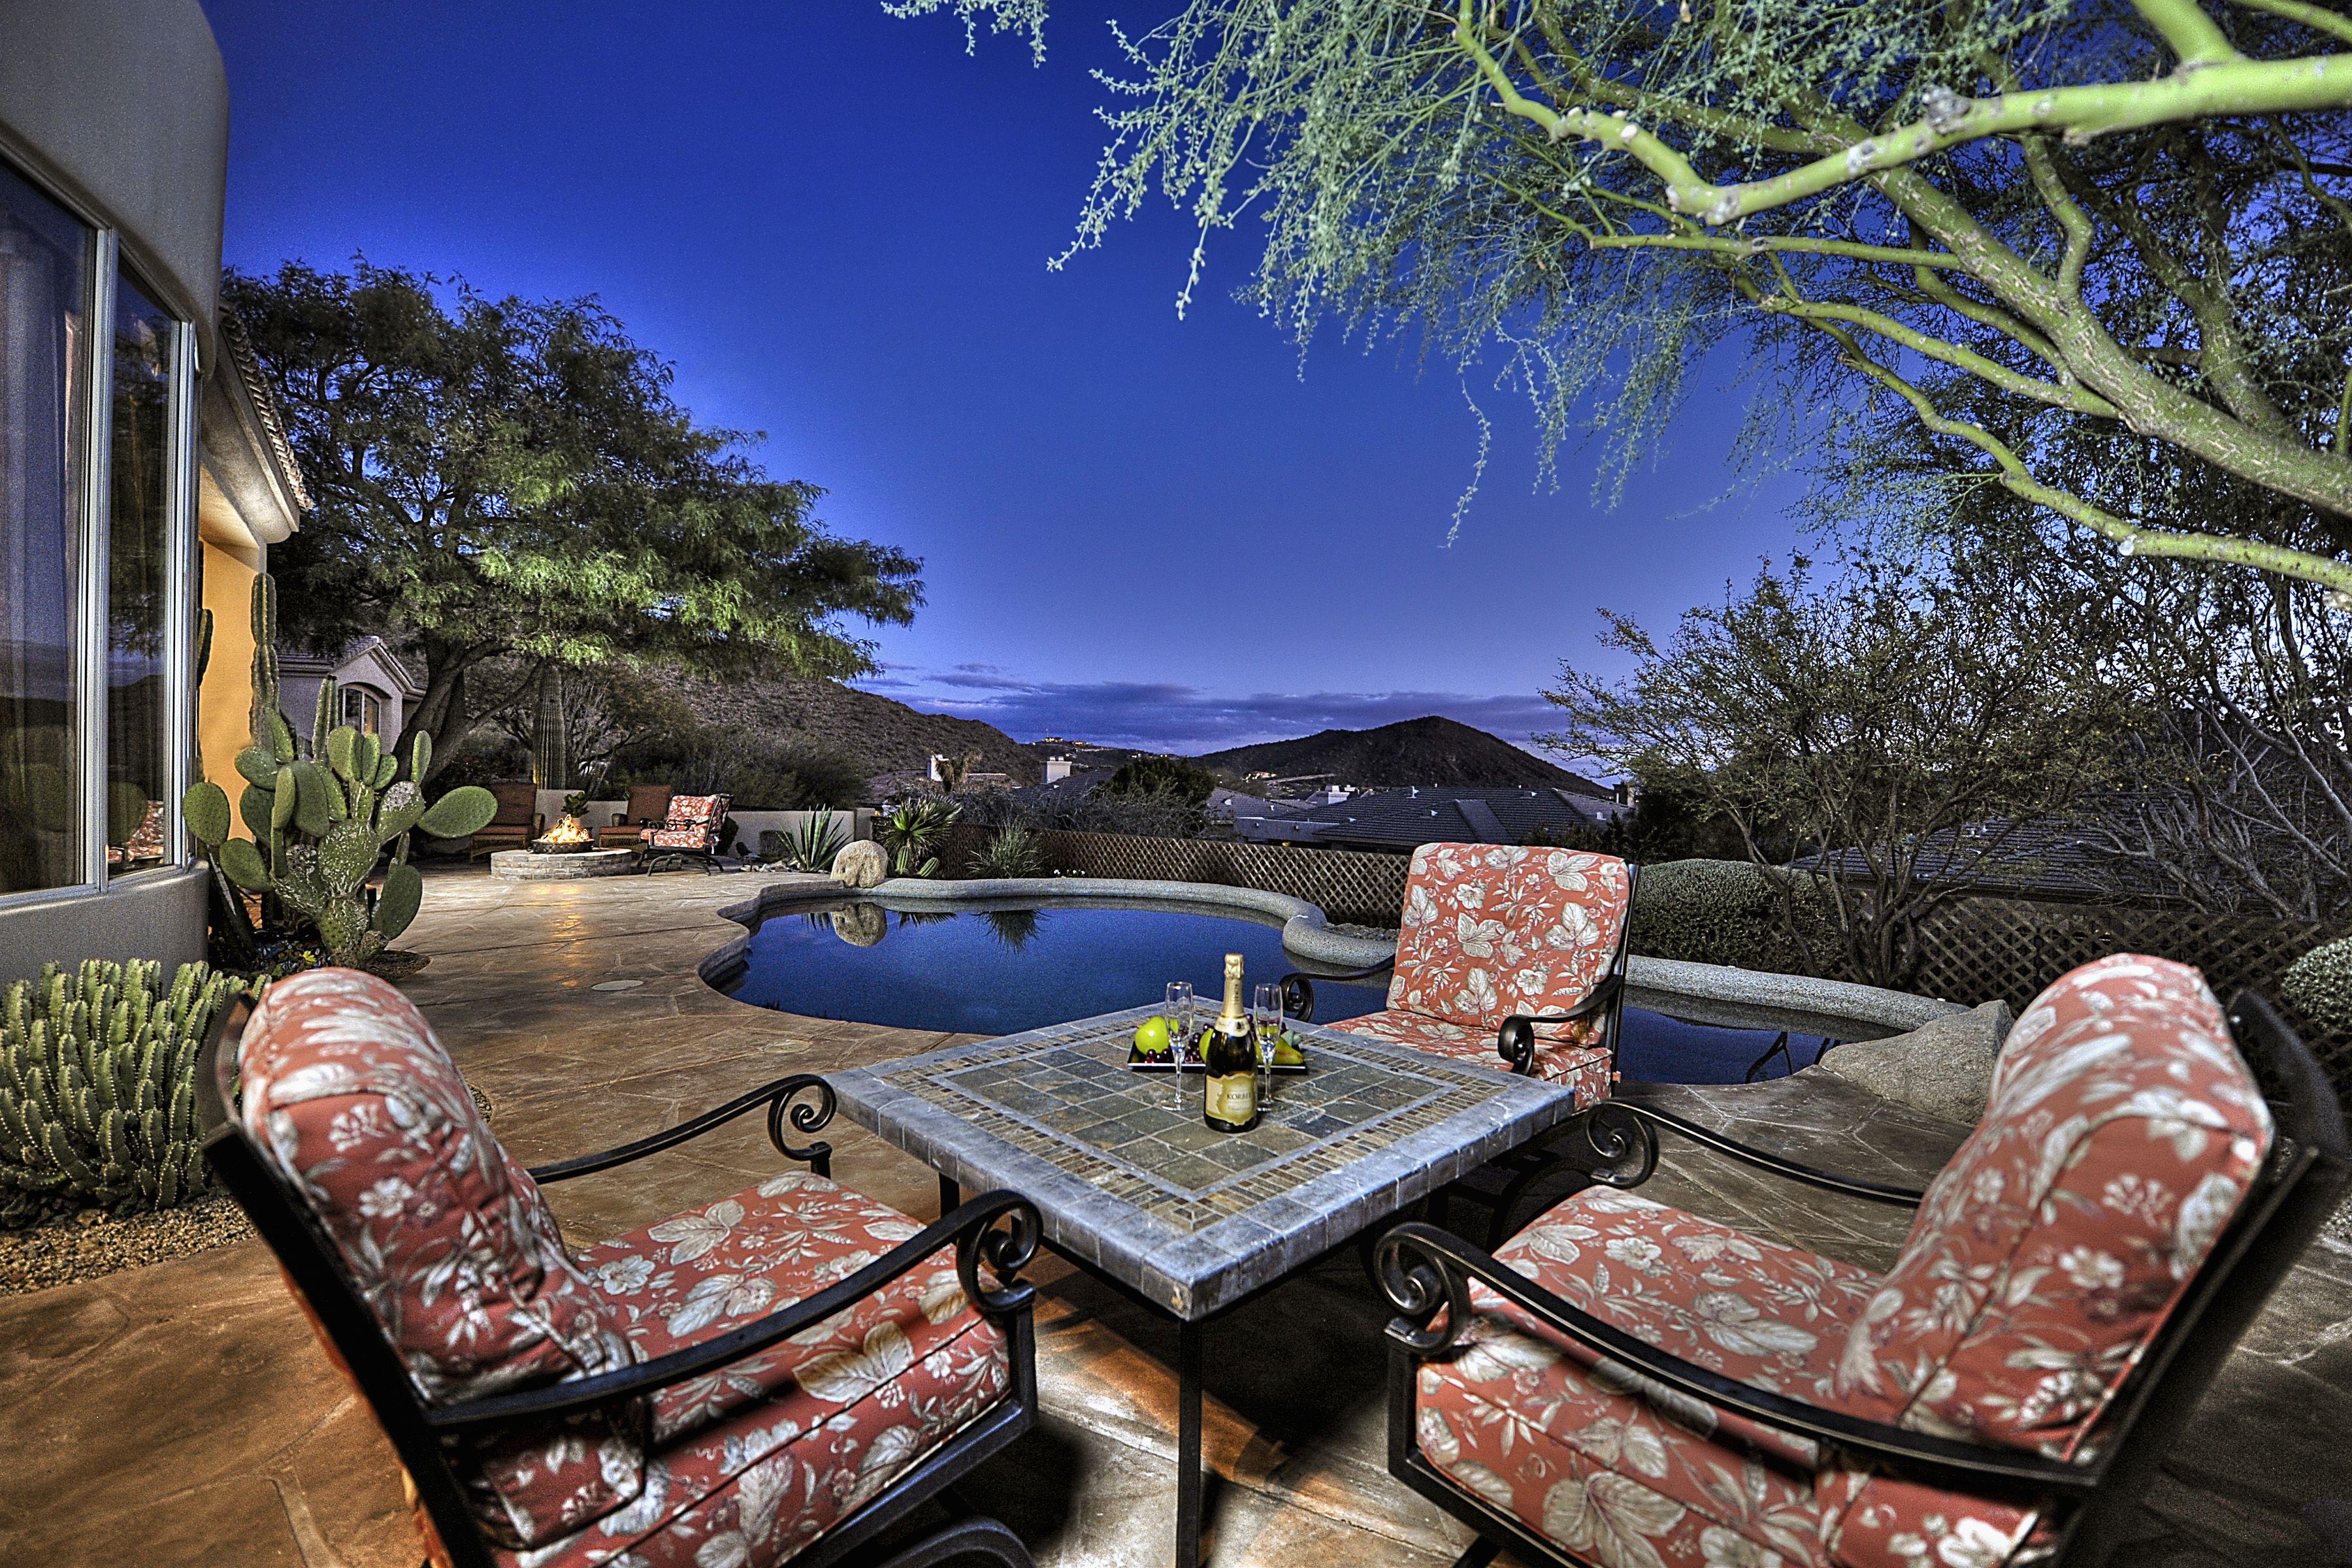 Outdoor Patio Perfect For Dining Al Fresco Scottsdale Arizona